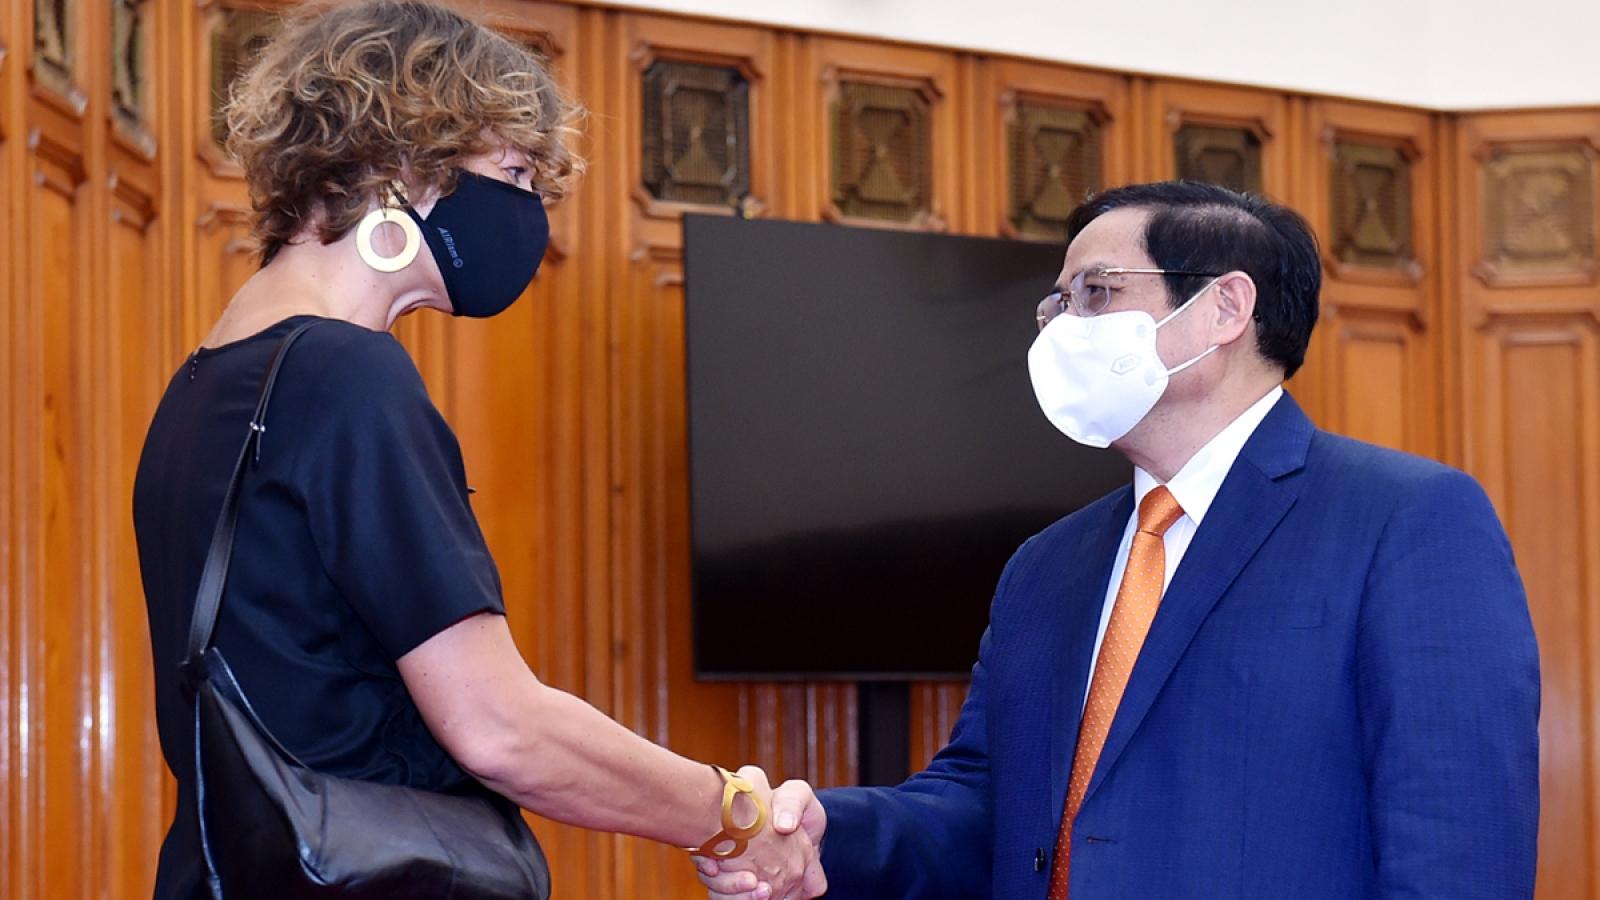 Netherlands donates ventilators and medical equipment to Vietnam